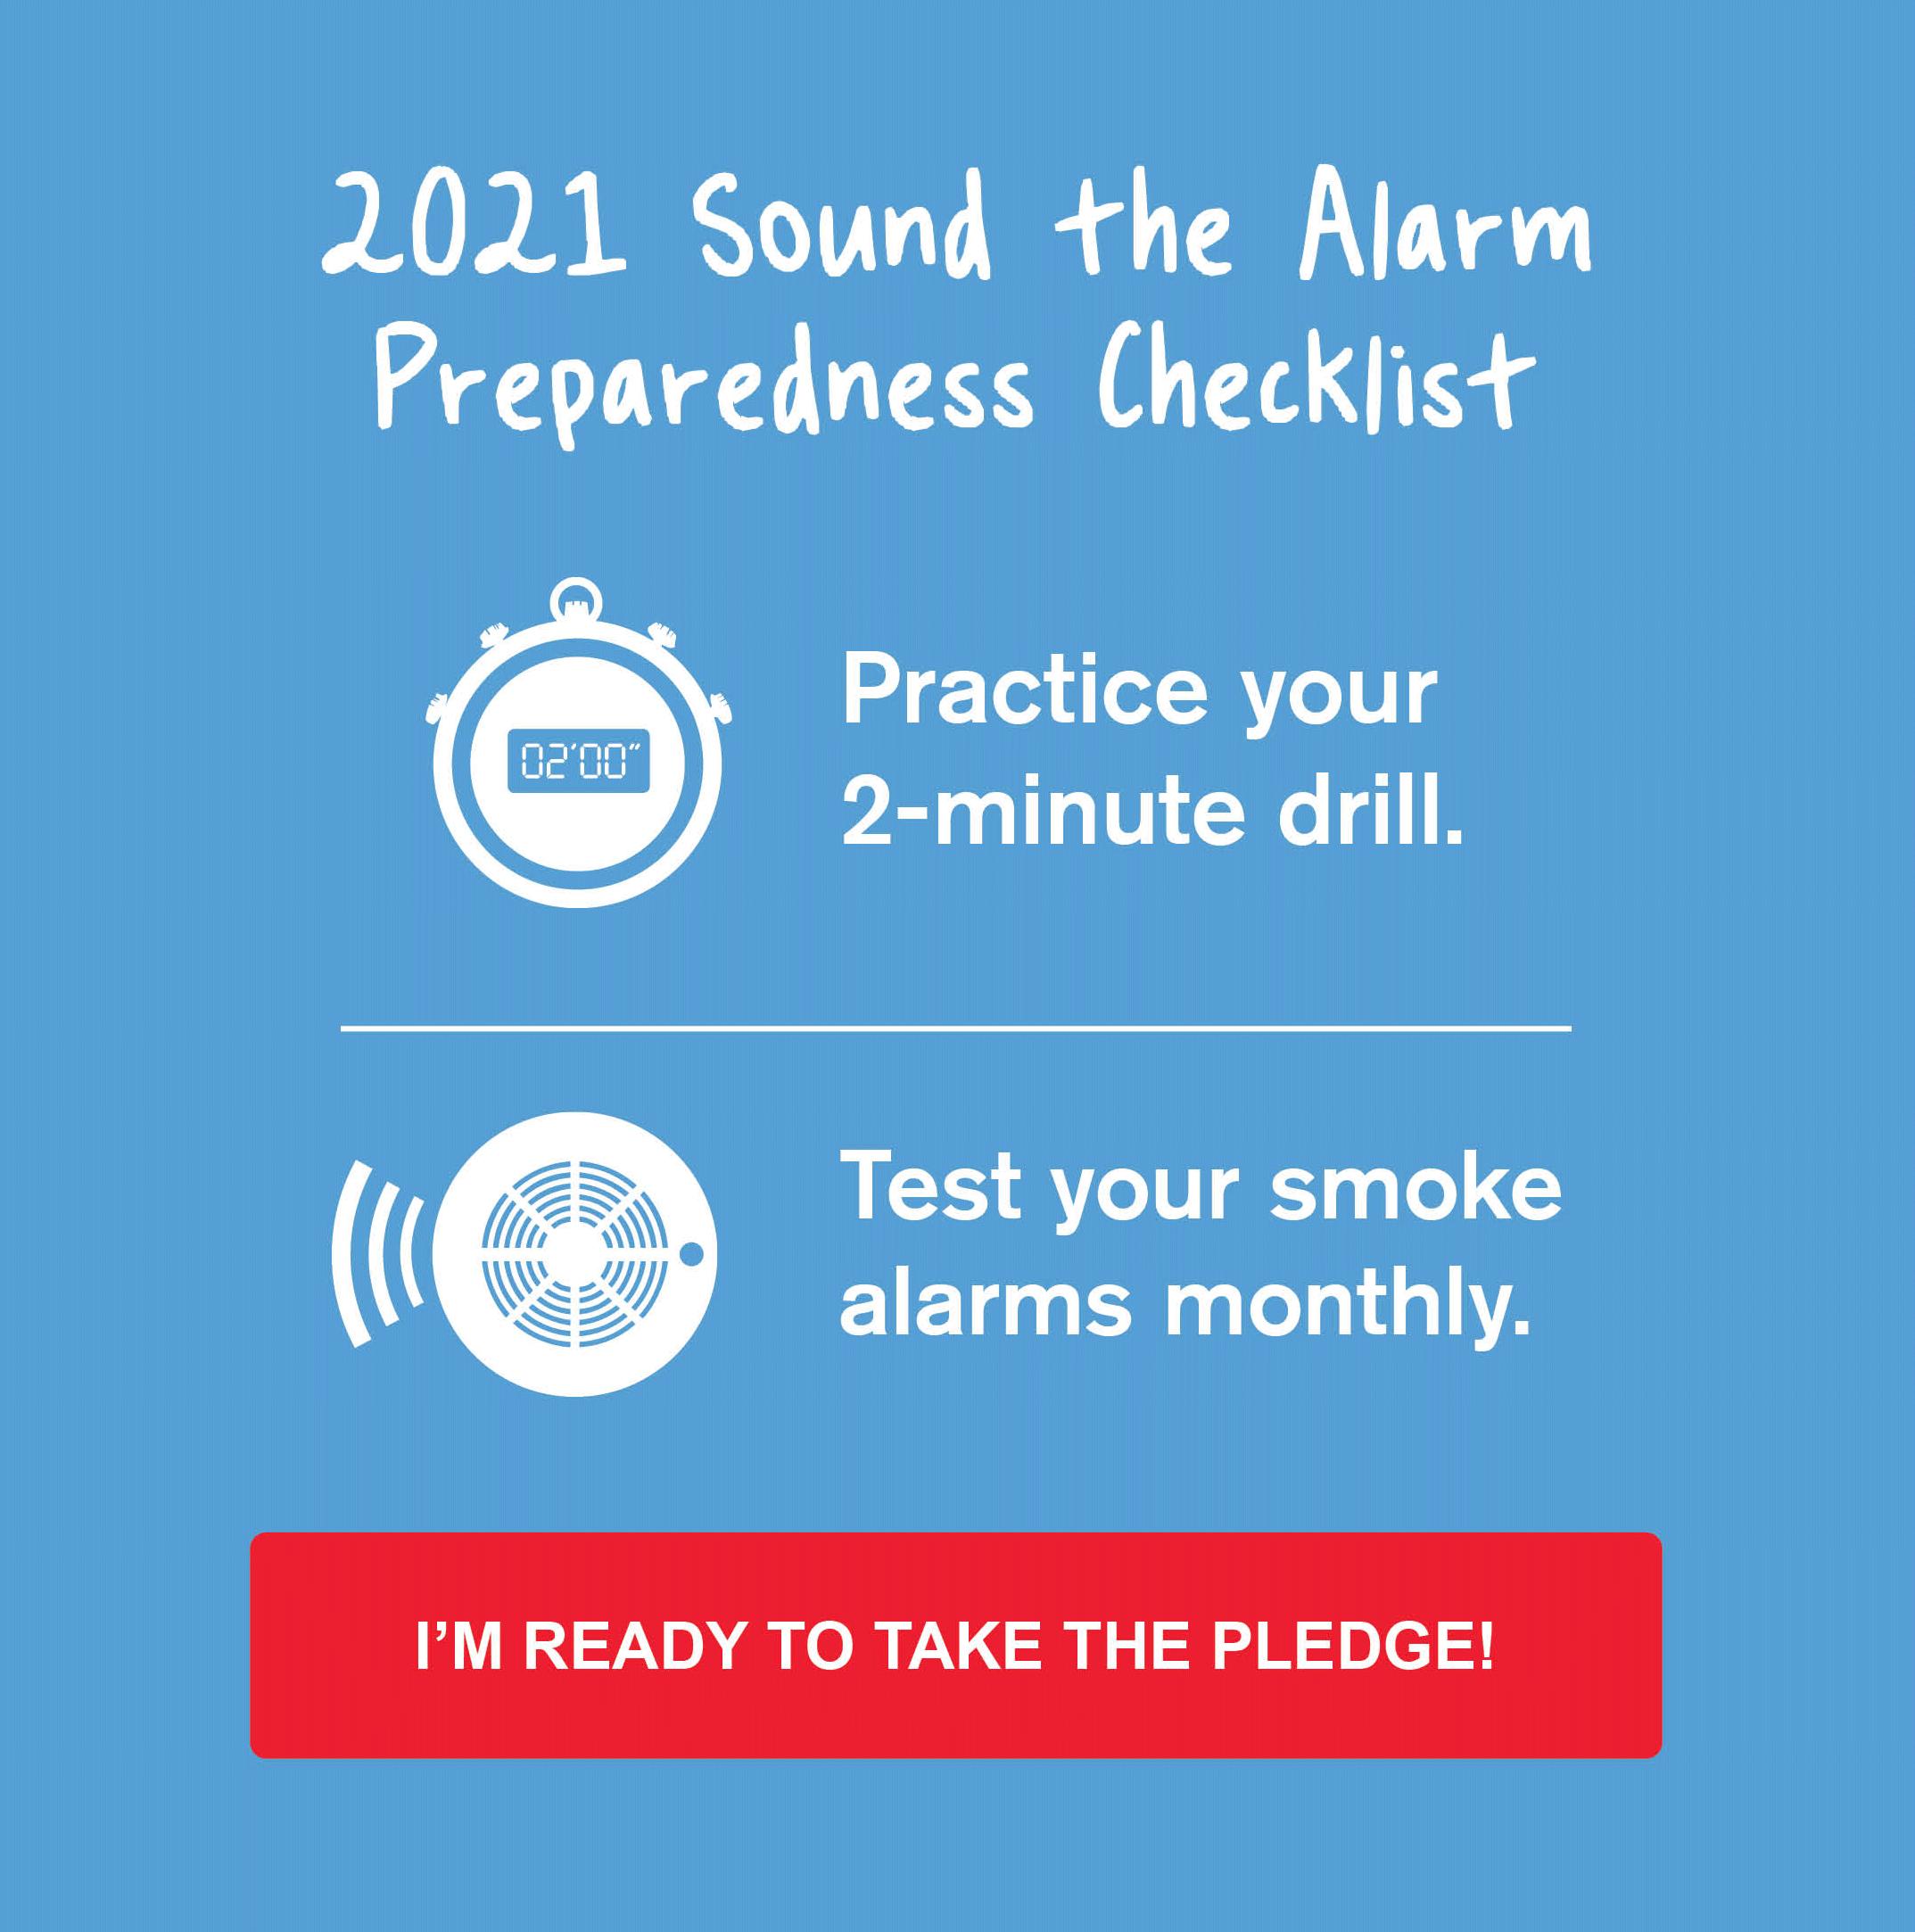 2021 Sound the Alarm Preparedness Checklist